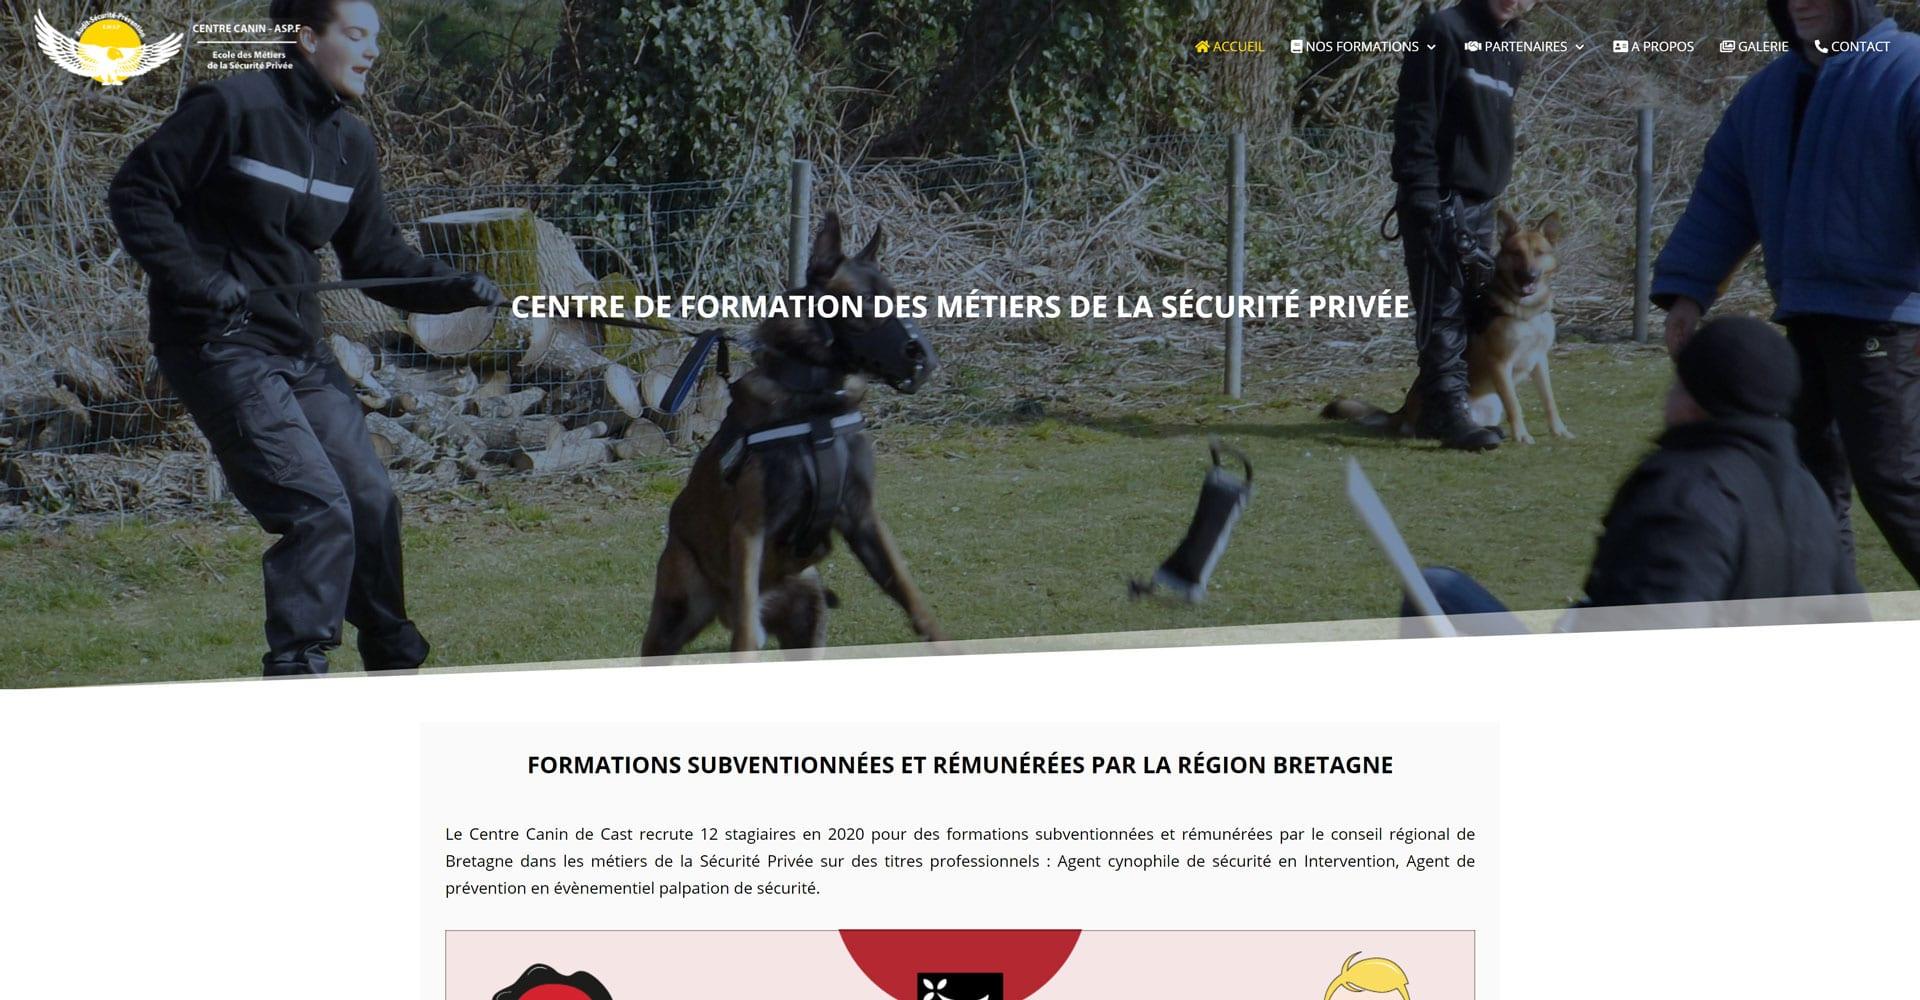 portofolio agence web offshore site centre canin de cast